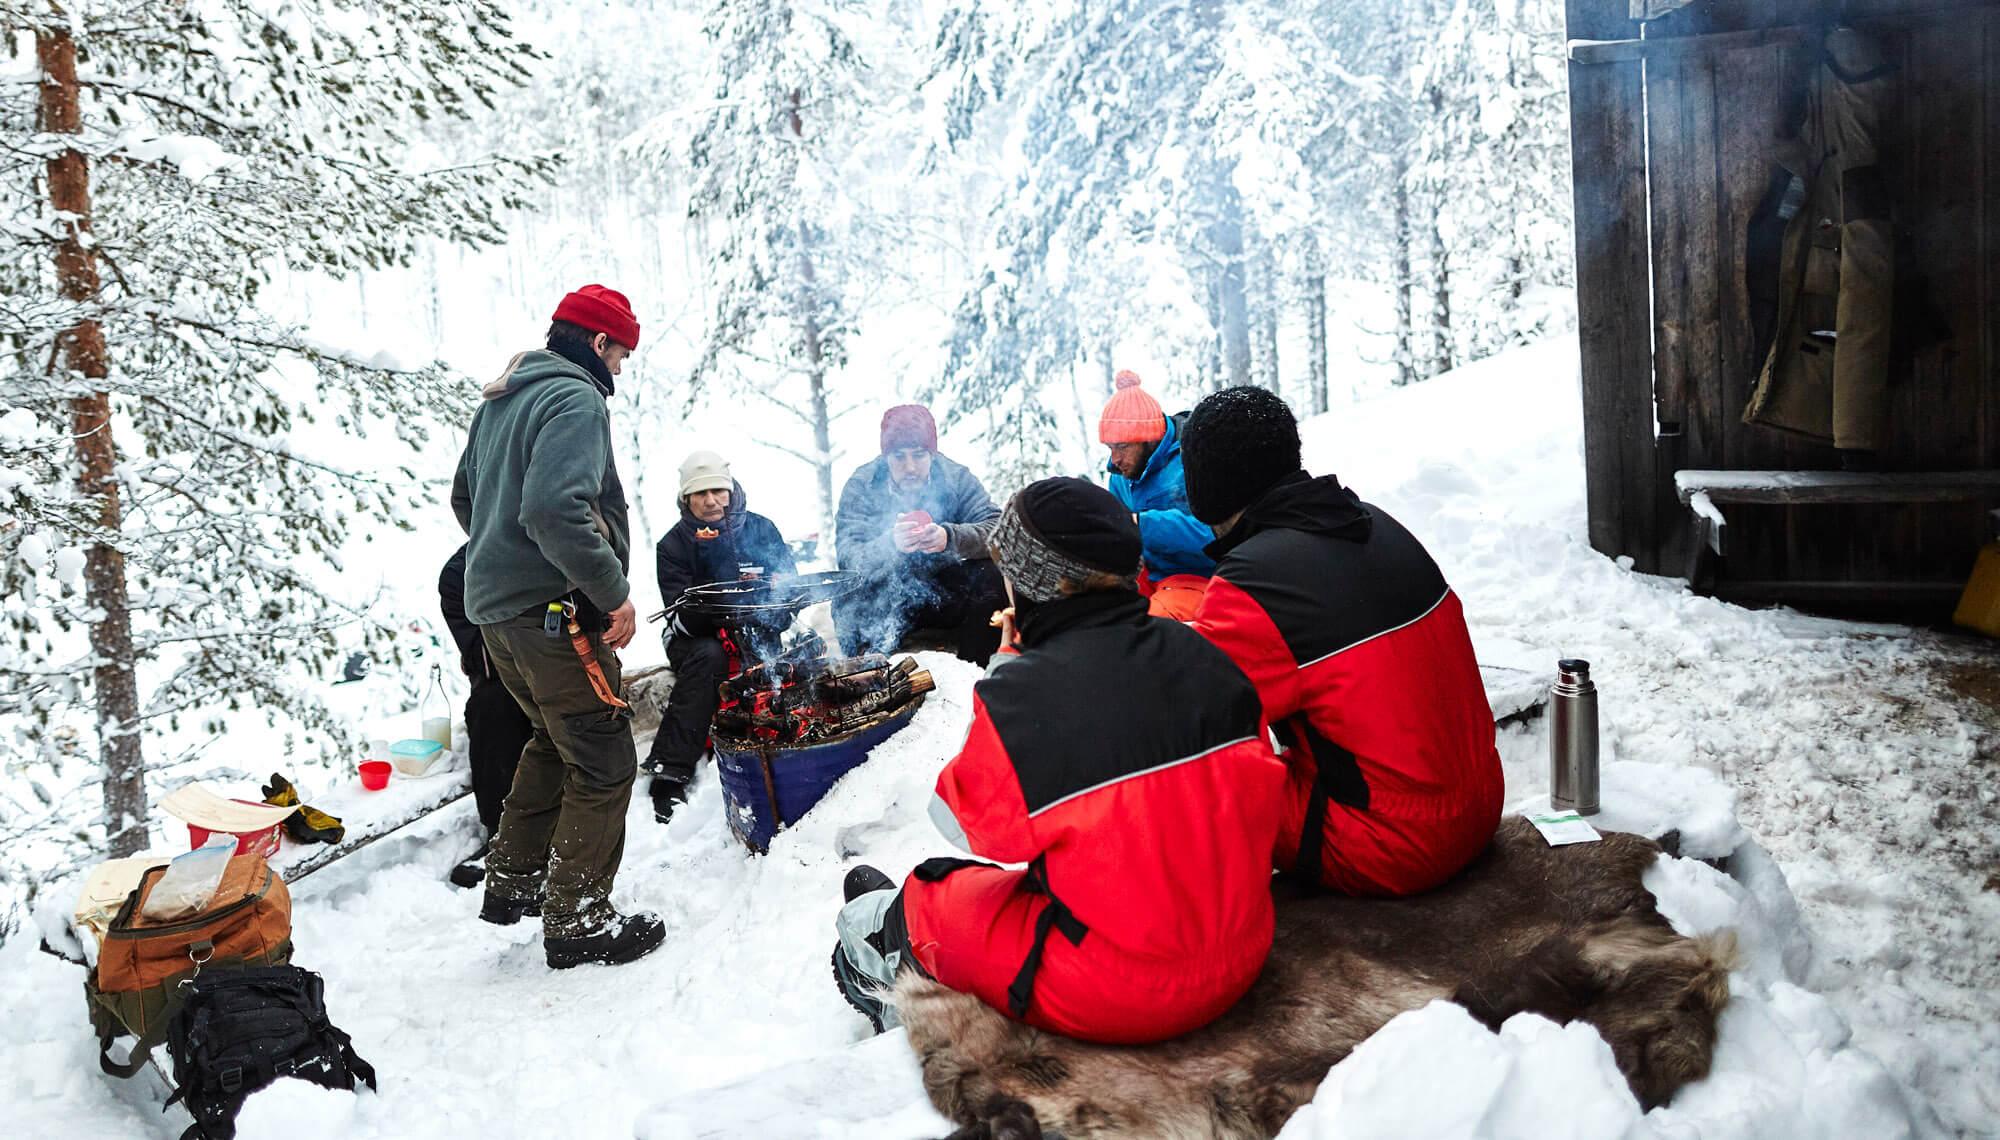 Outdoor lunch break during a dog sledding trek adventure in Swedish Lapland